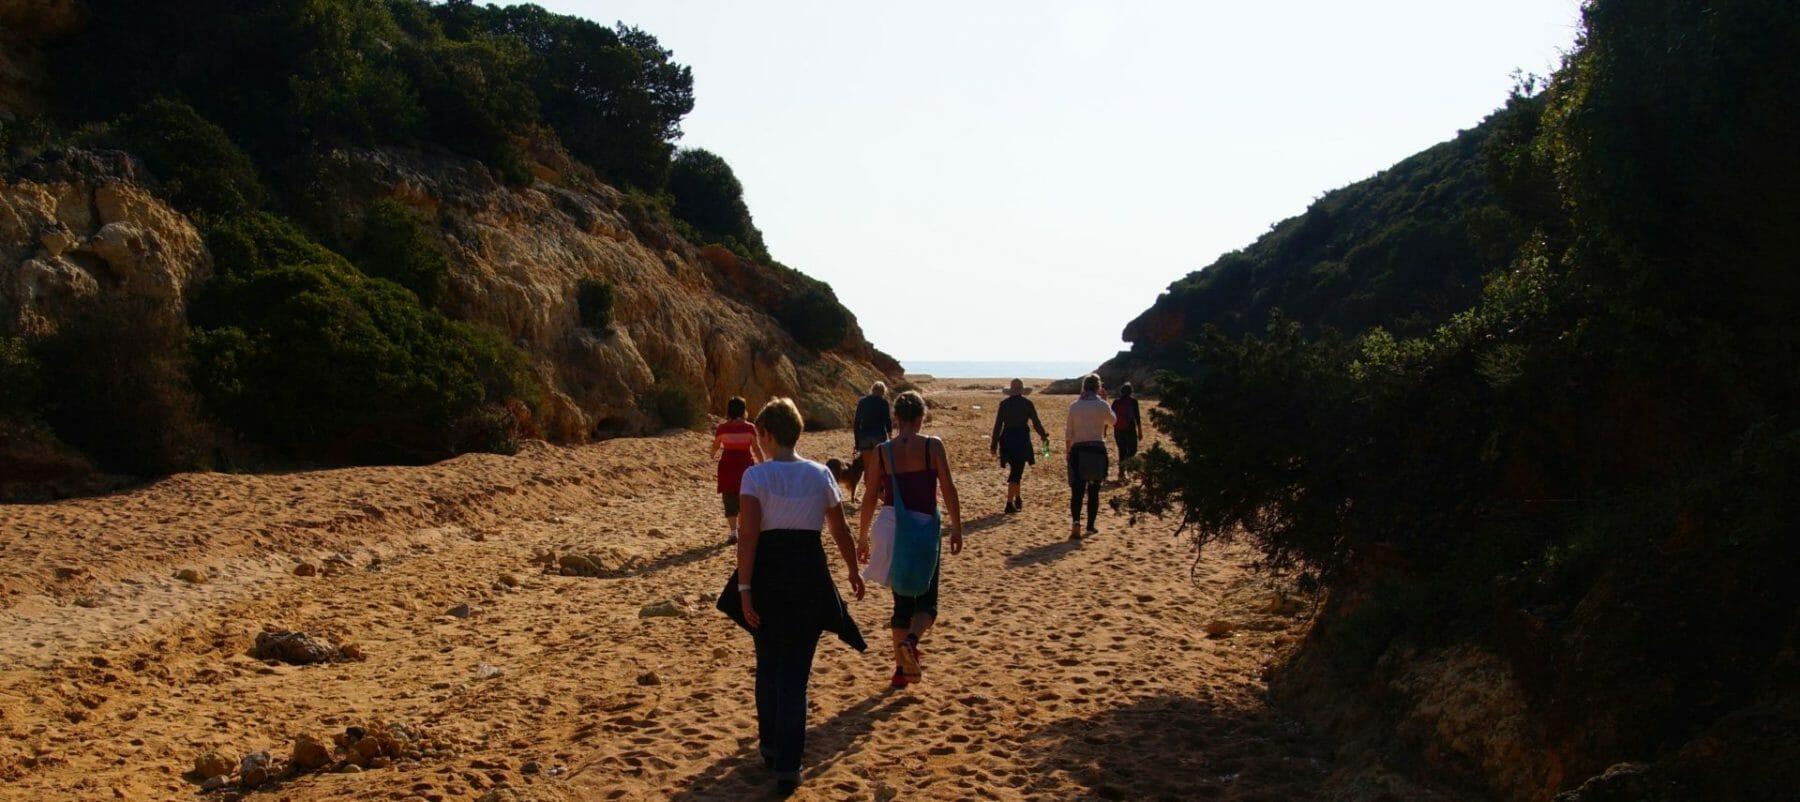 Yoga Retreat - Wandern im Canyon mit Blick mit Blick aufs Meer